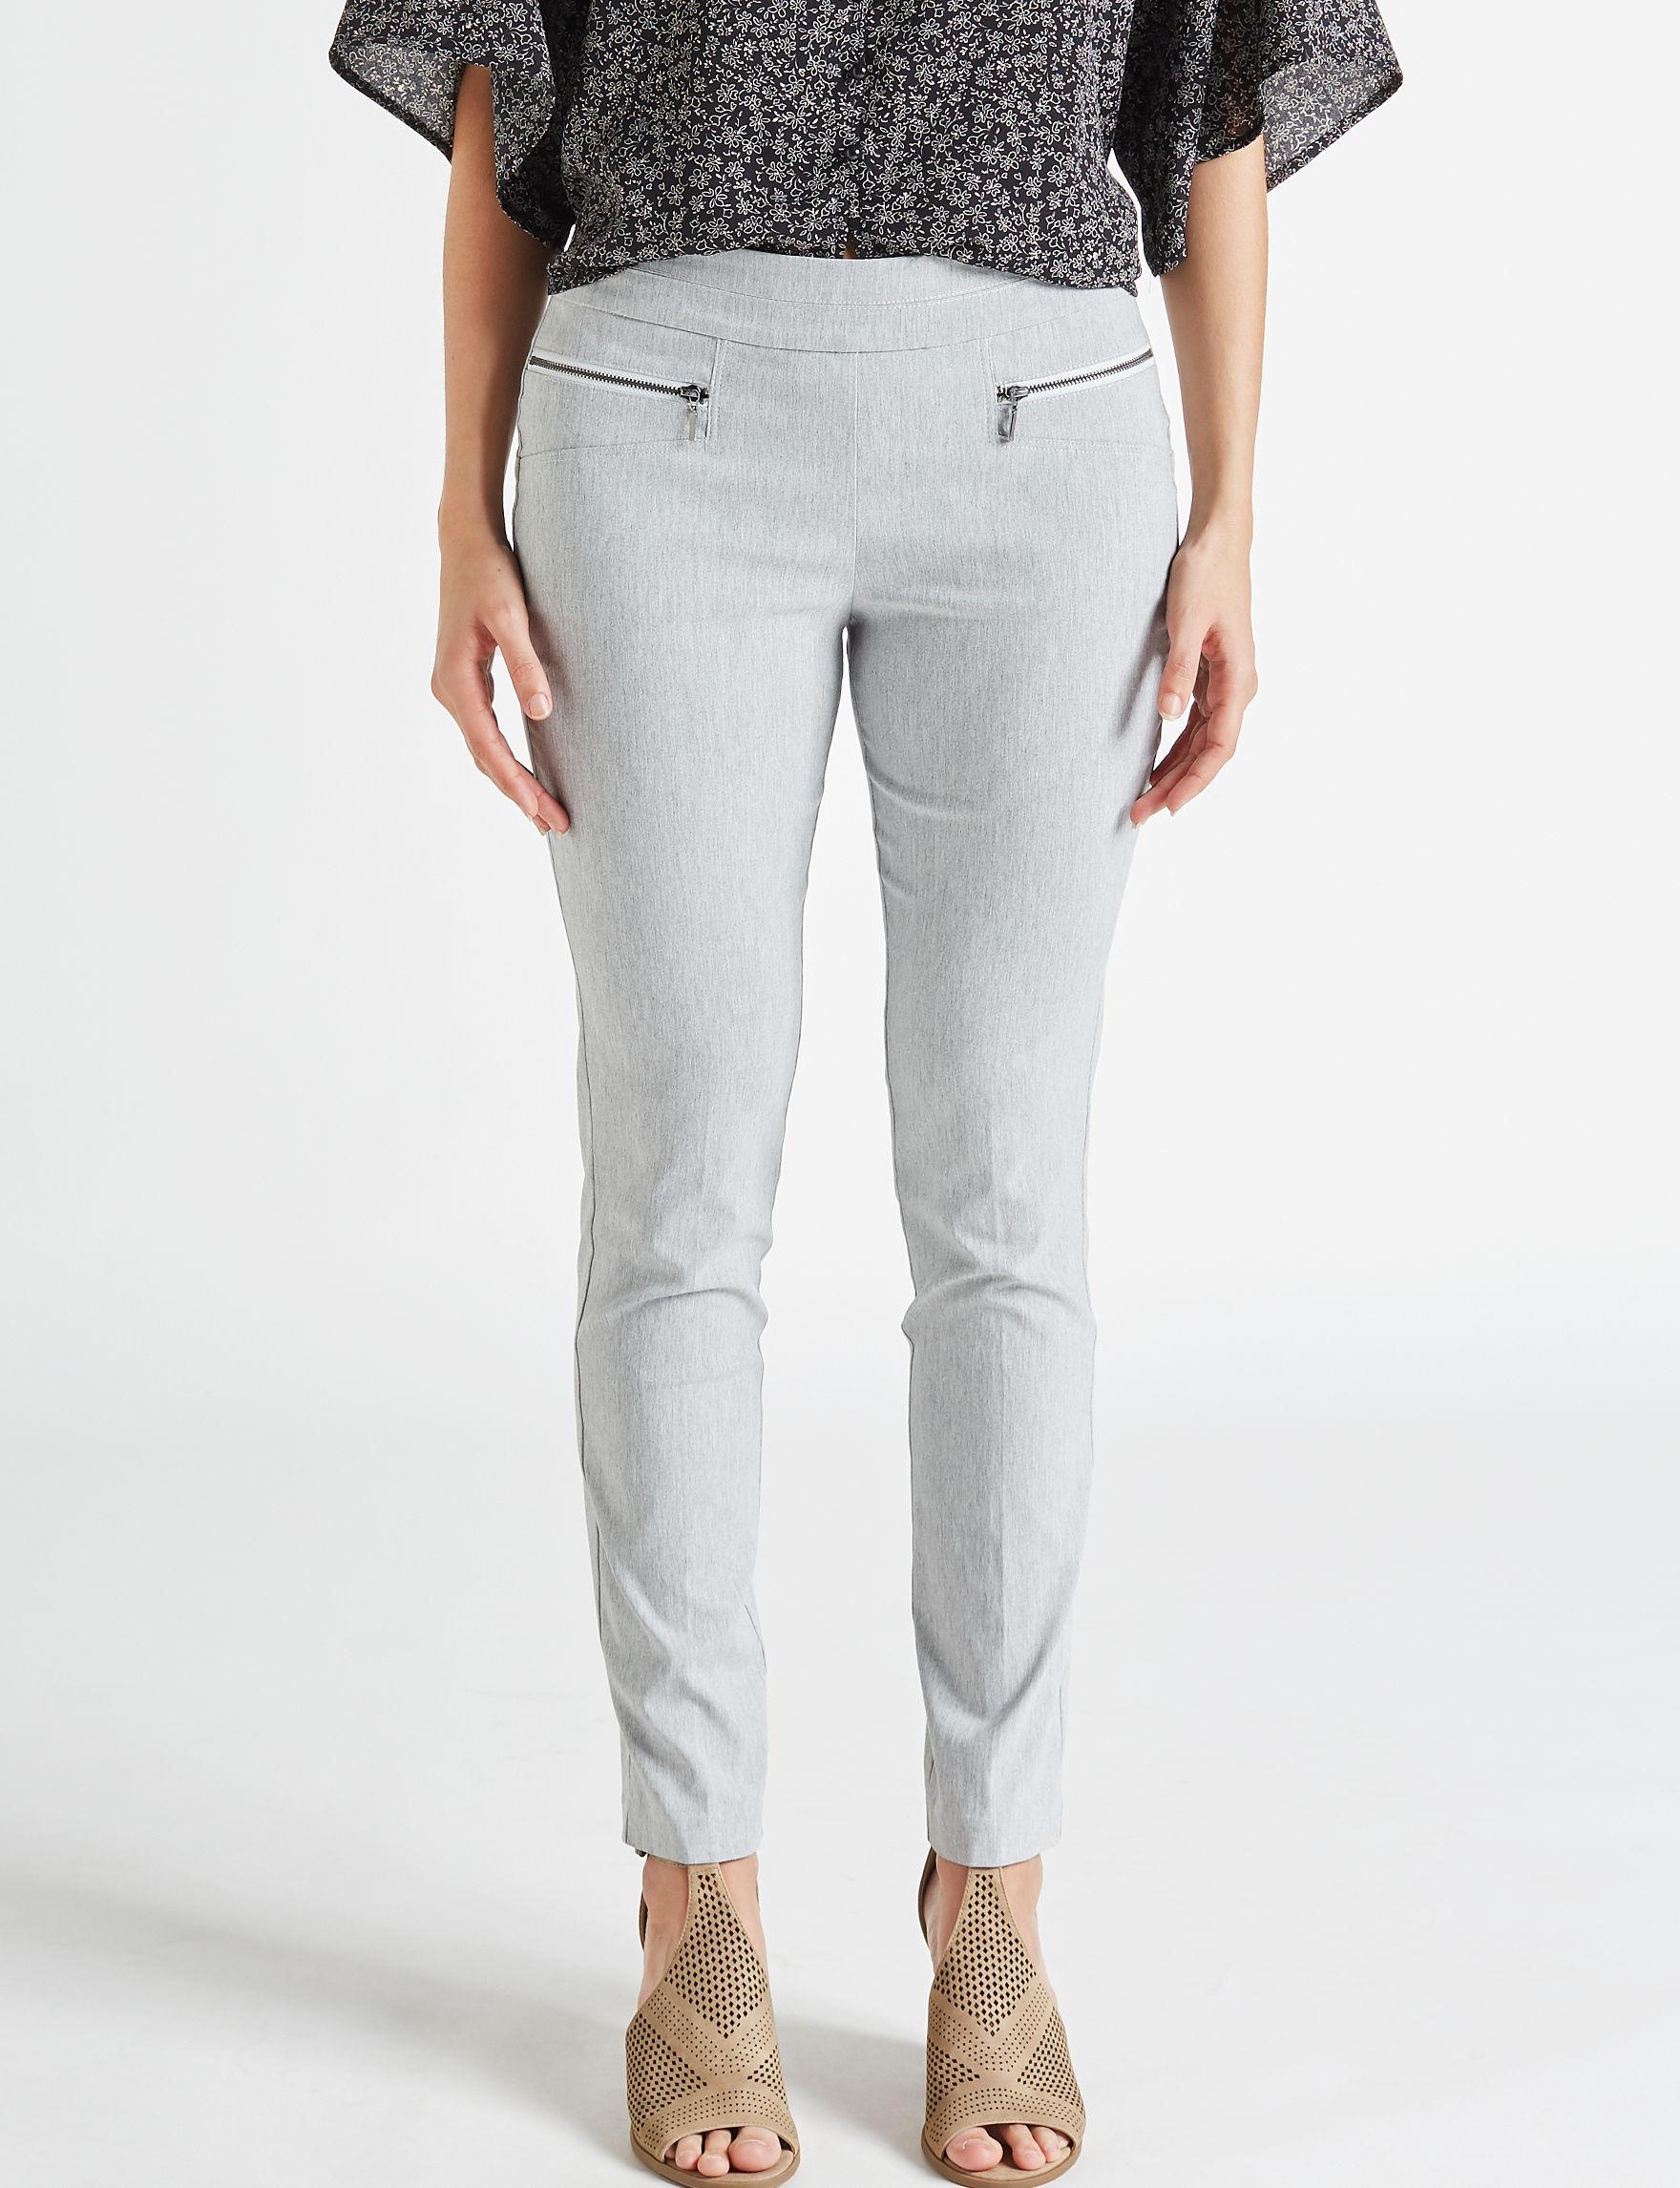 Leighton Grey Skinny